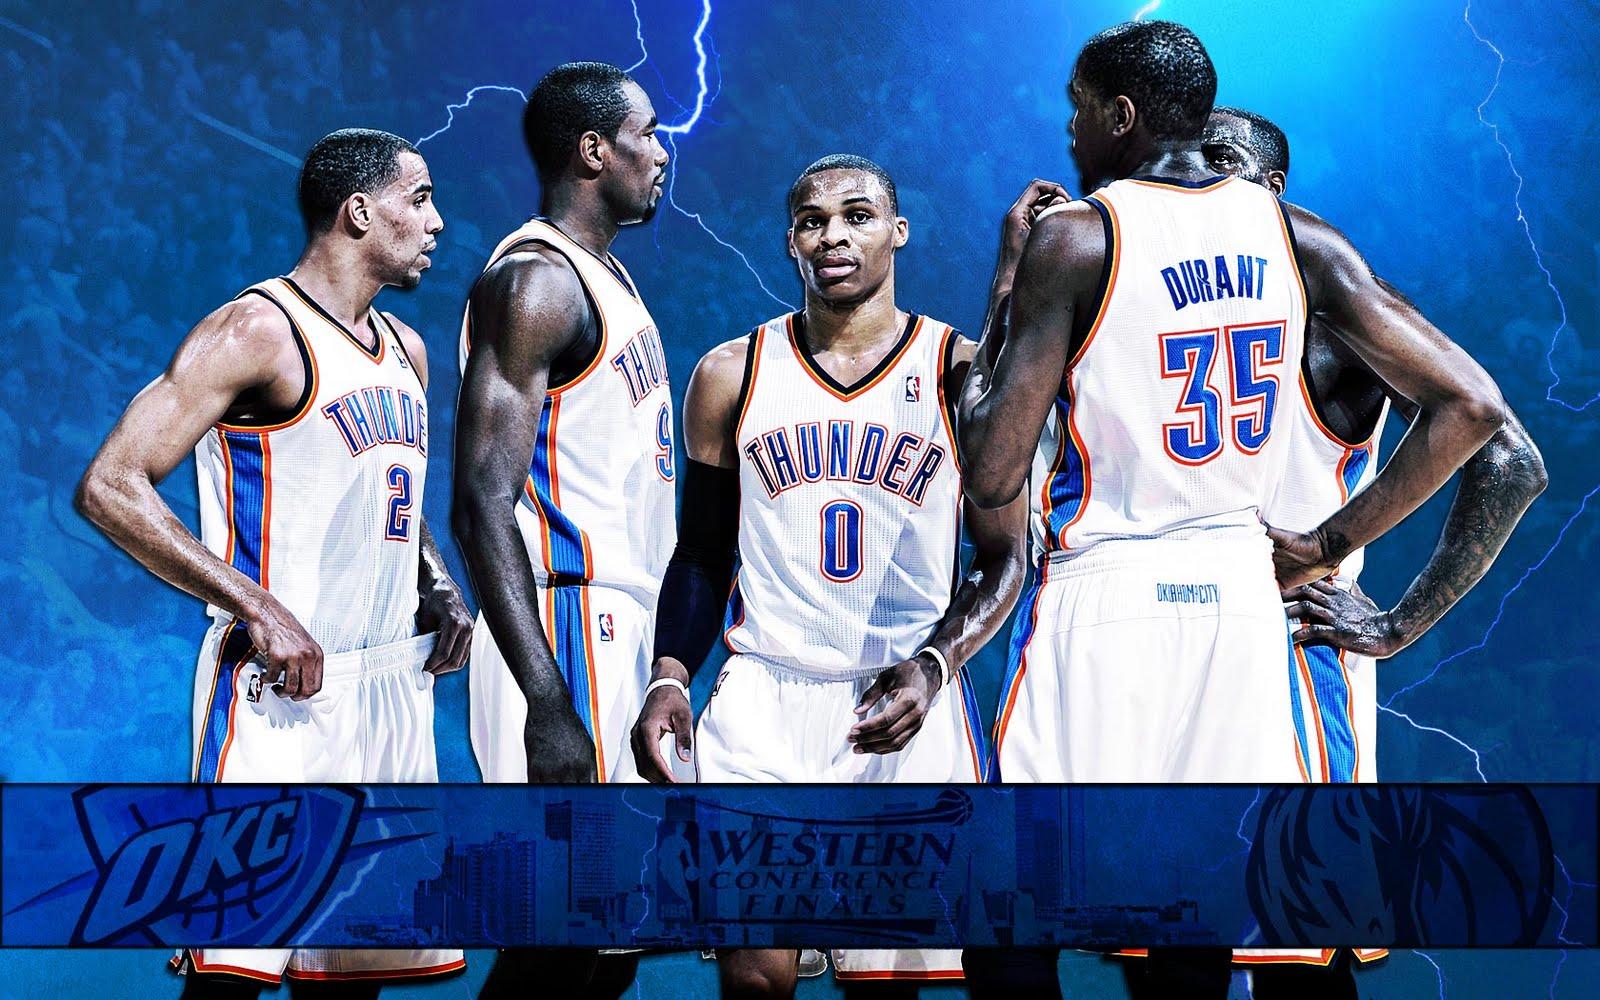 http://4.bp.blogspot.com/-sZwUKTAlWJk/TeMm4L4eMyI/AAAAAAAAE9s/j5aoGNJHCZc/s1600/Oklahoma-City-Thunder-2011-NBA-Conference-Finals-Widescreen-Wallpaper.jpg